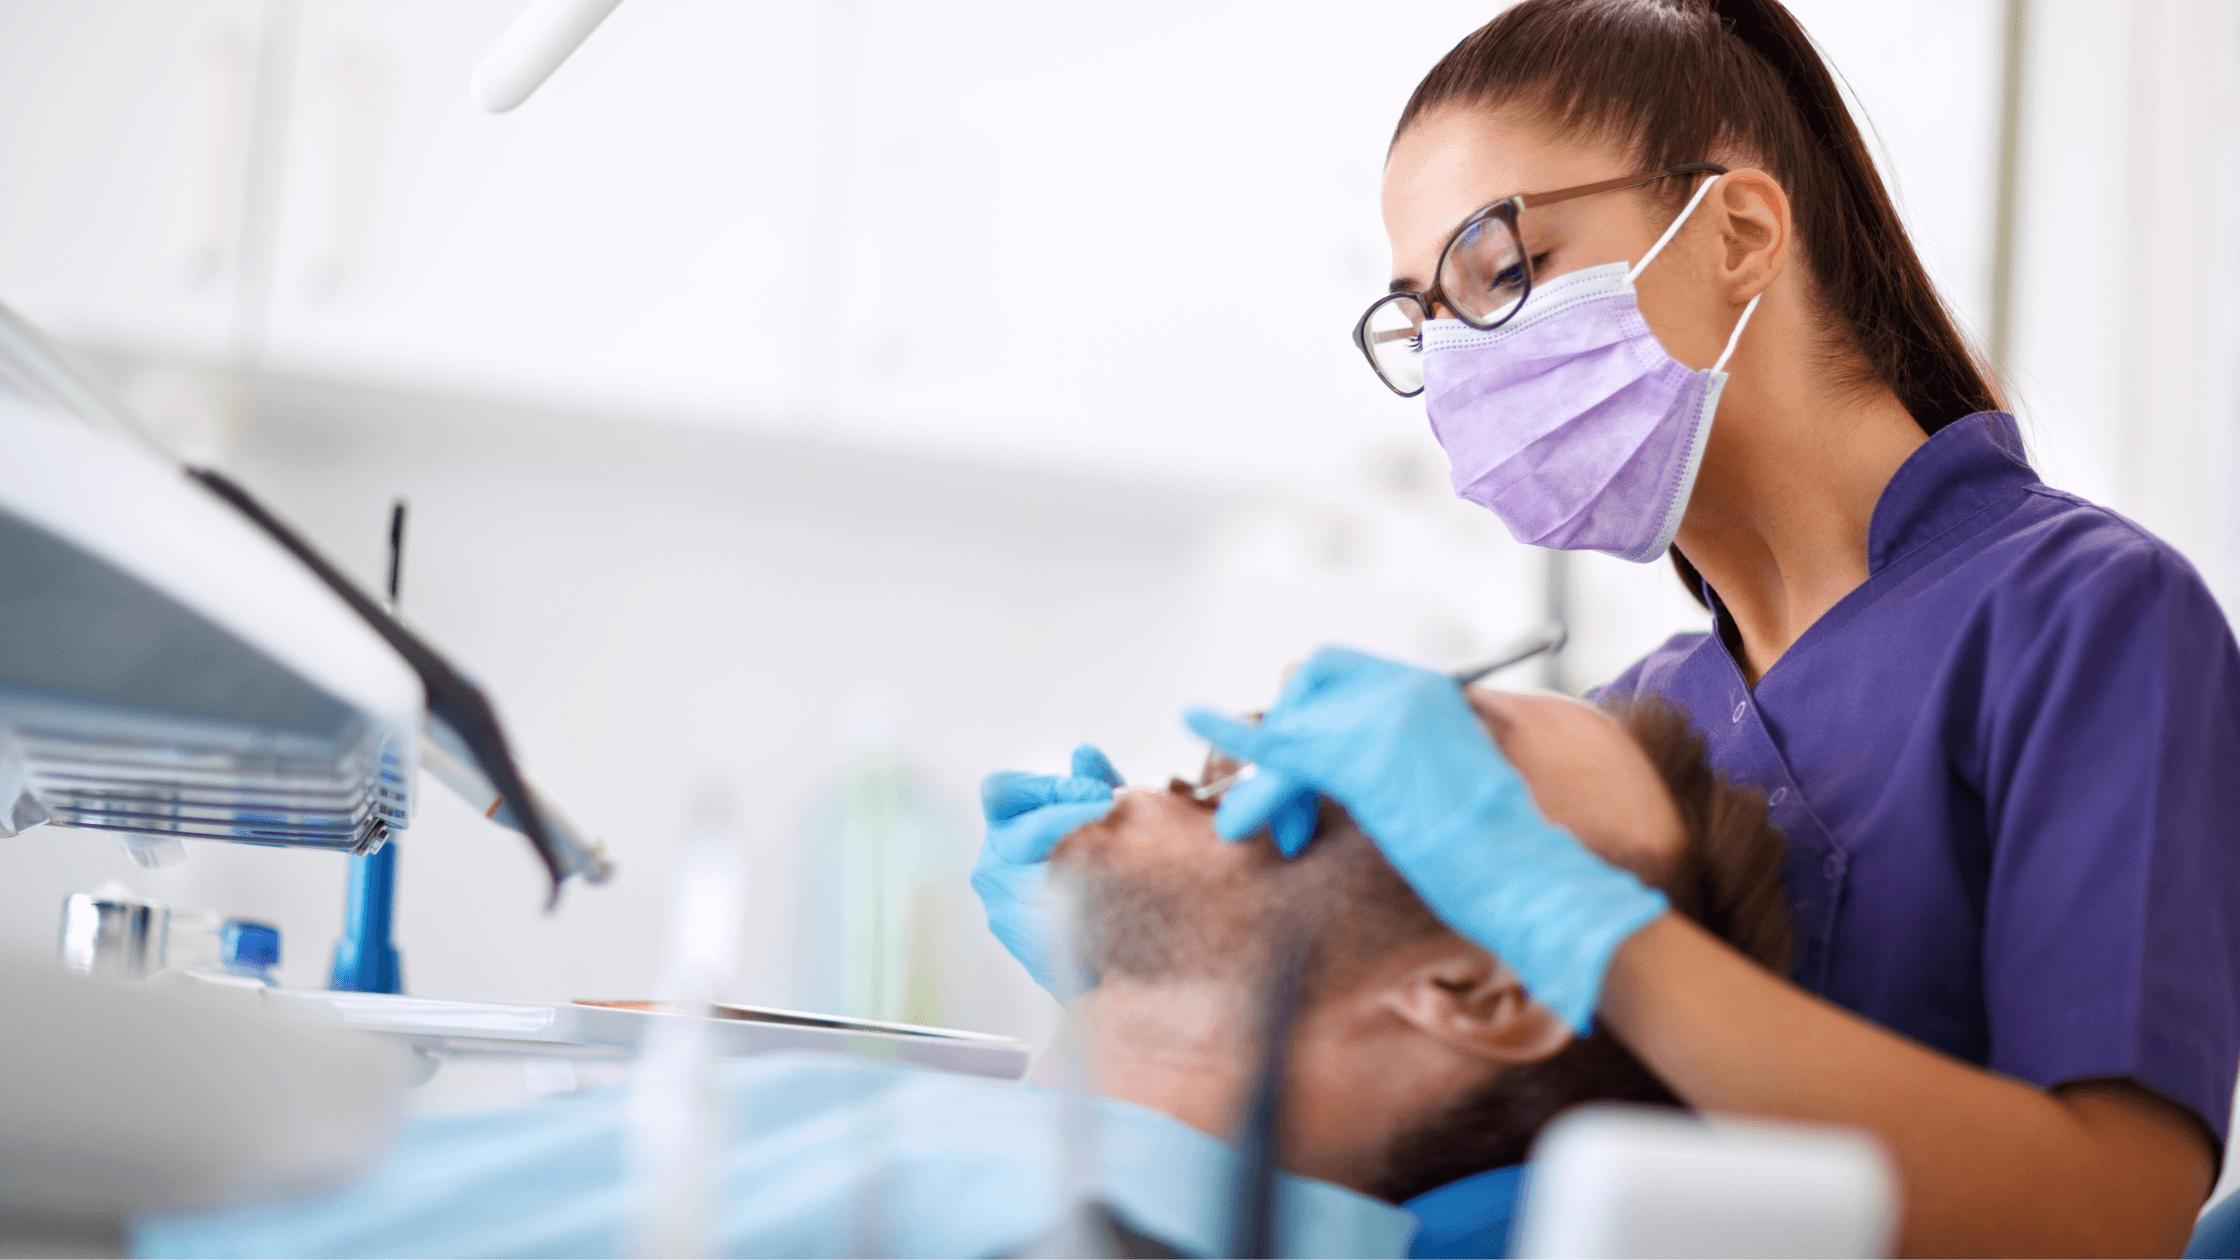 Dental Trauma: What do I do in a dental emergency?